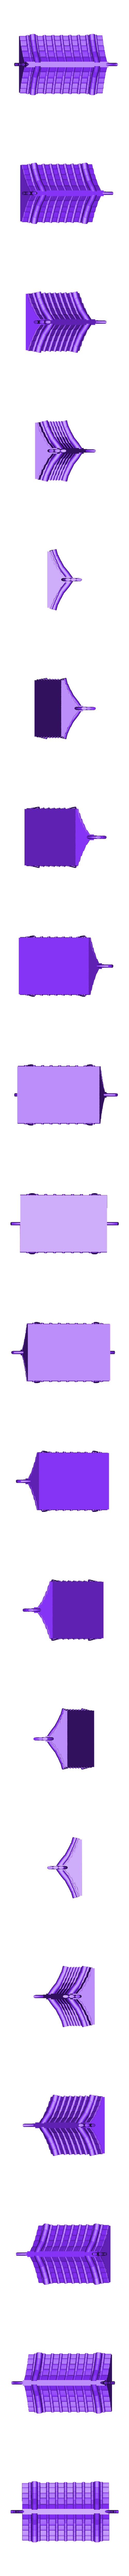 Main Gate Roof.stl Download STL file Modular Magnetic Japanese Gate • 3D print model, HyperMiniatures